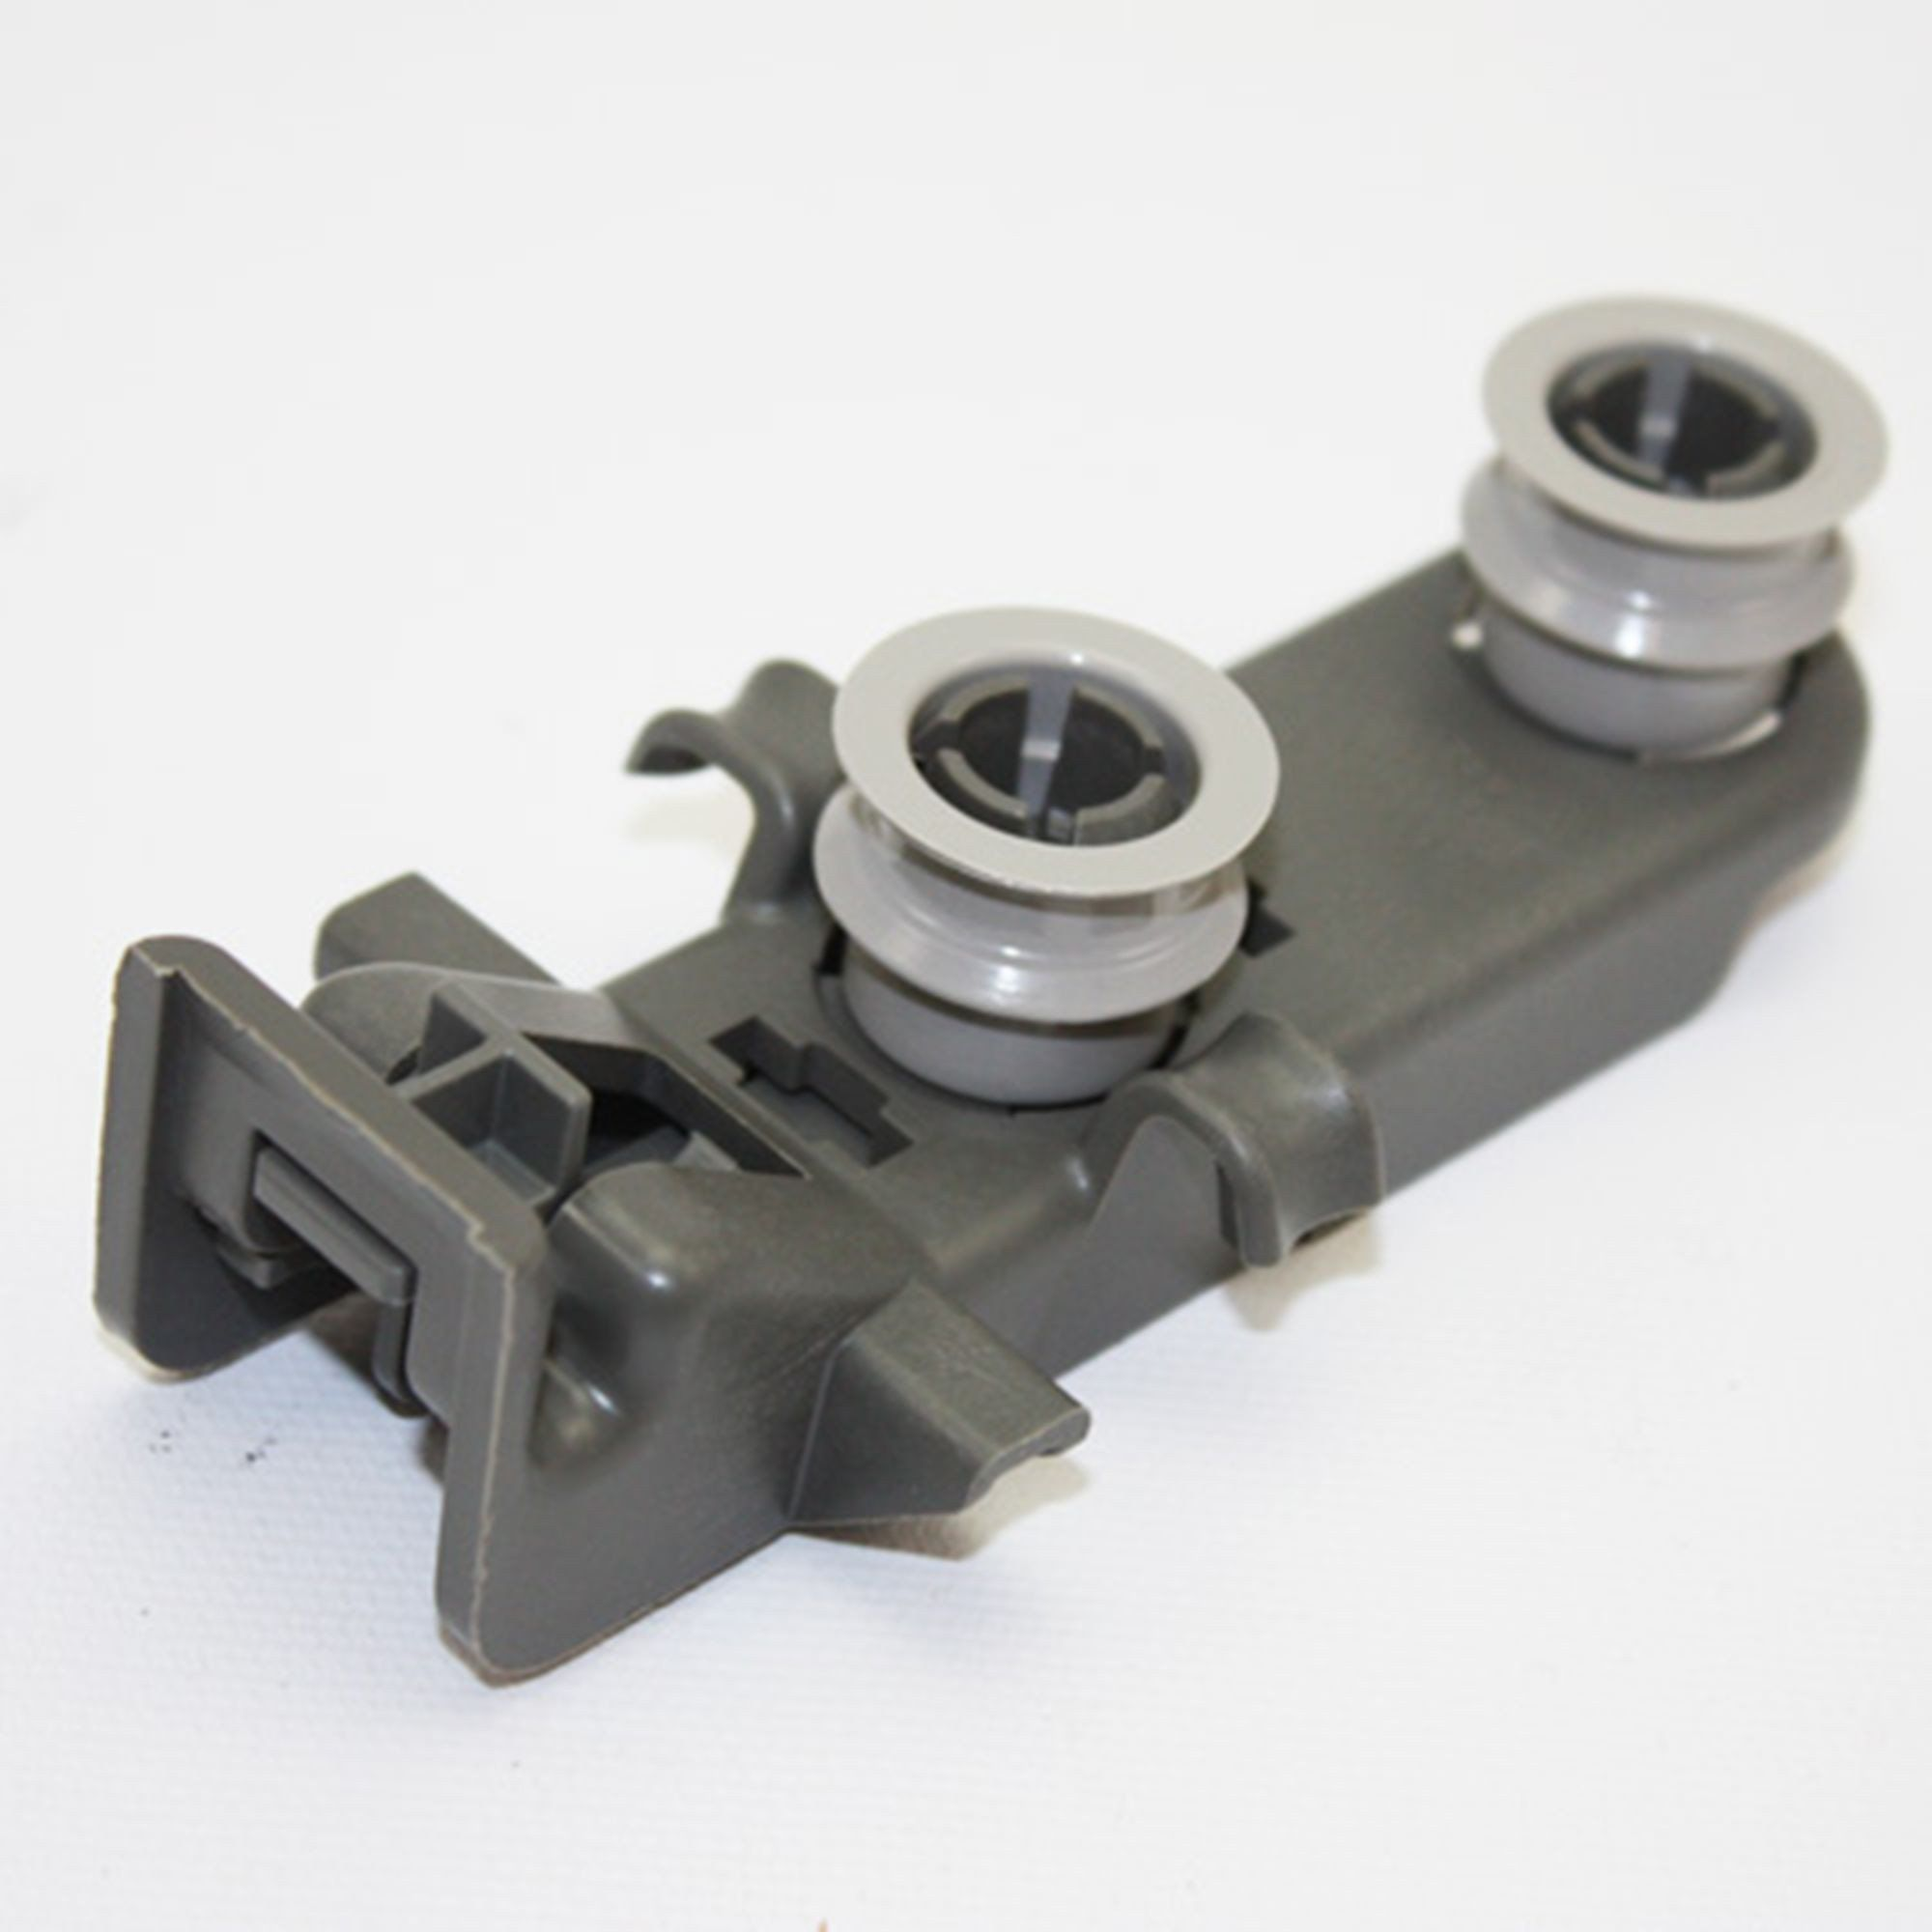 W10350401 whirlpool dishwasher dishrack roller whirlpool